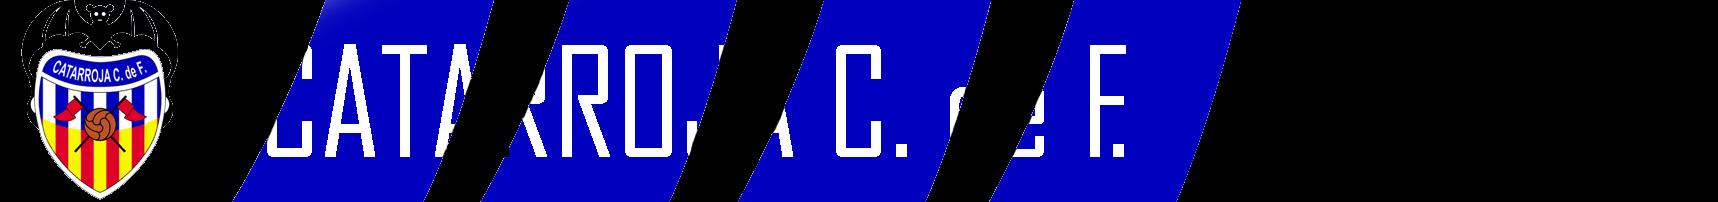 Catarroja C. de F.